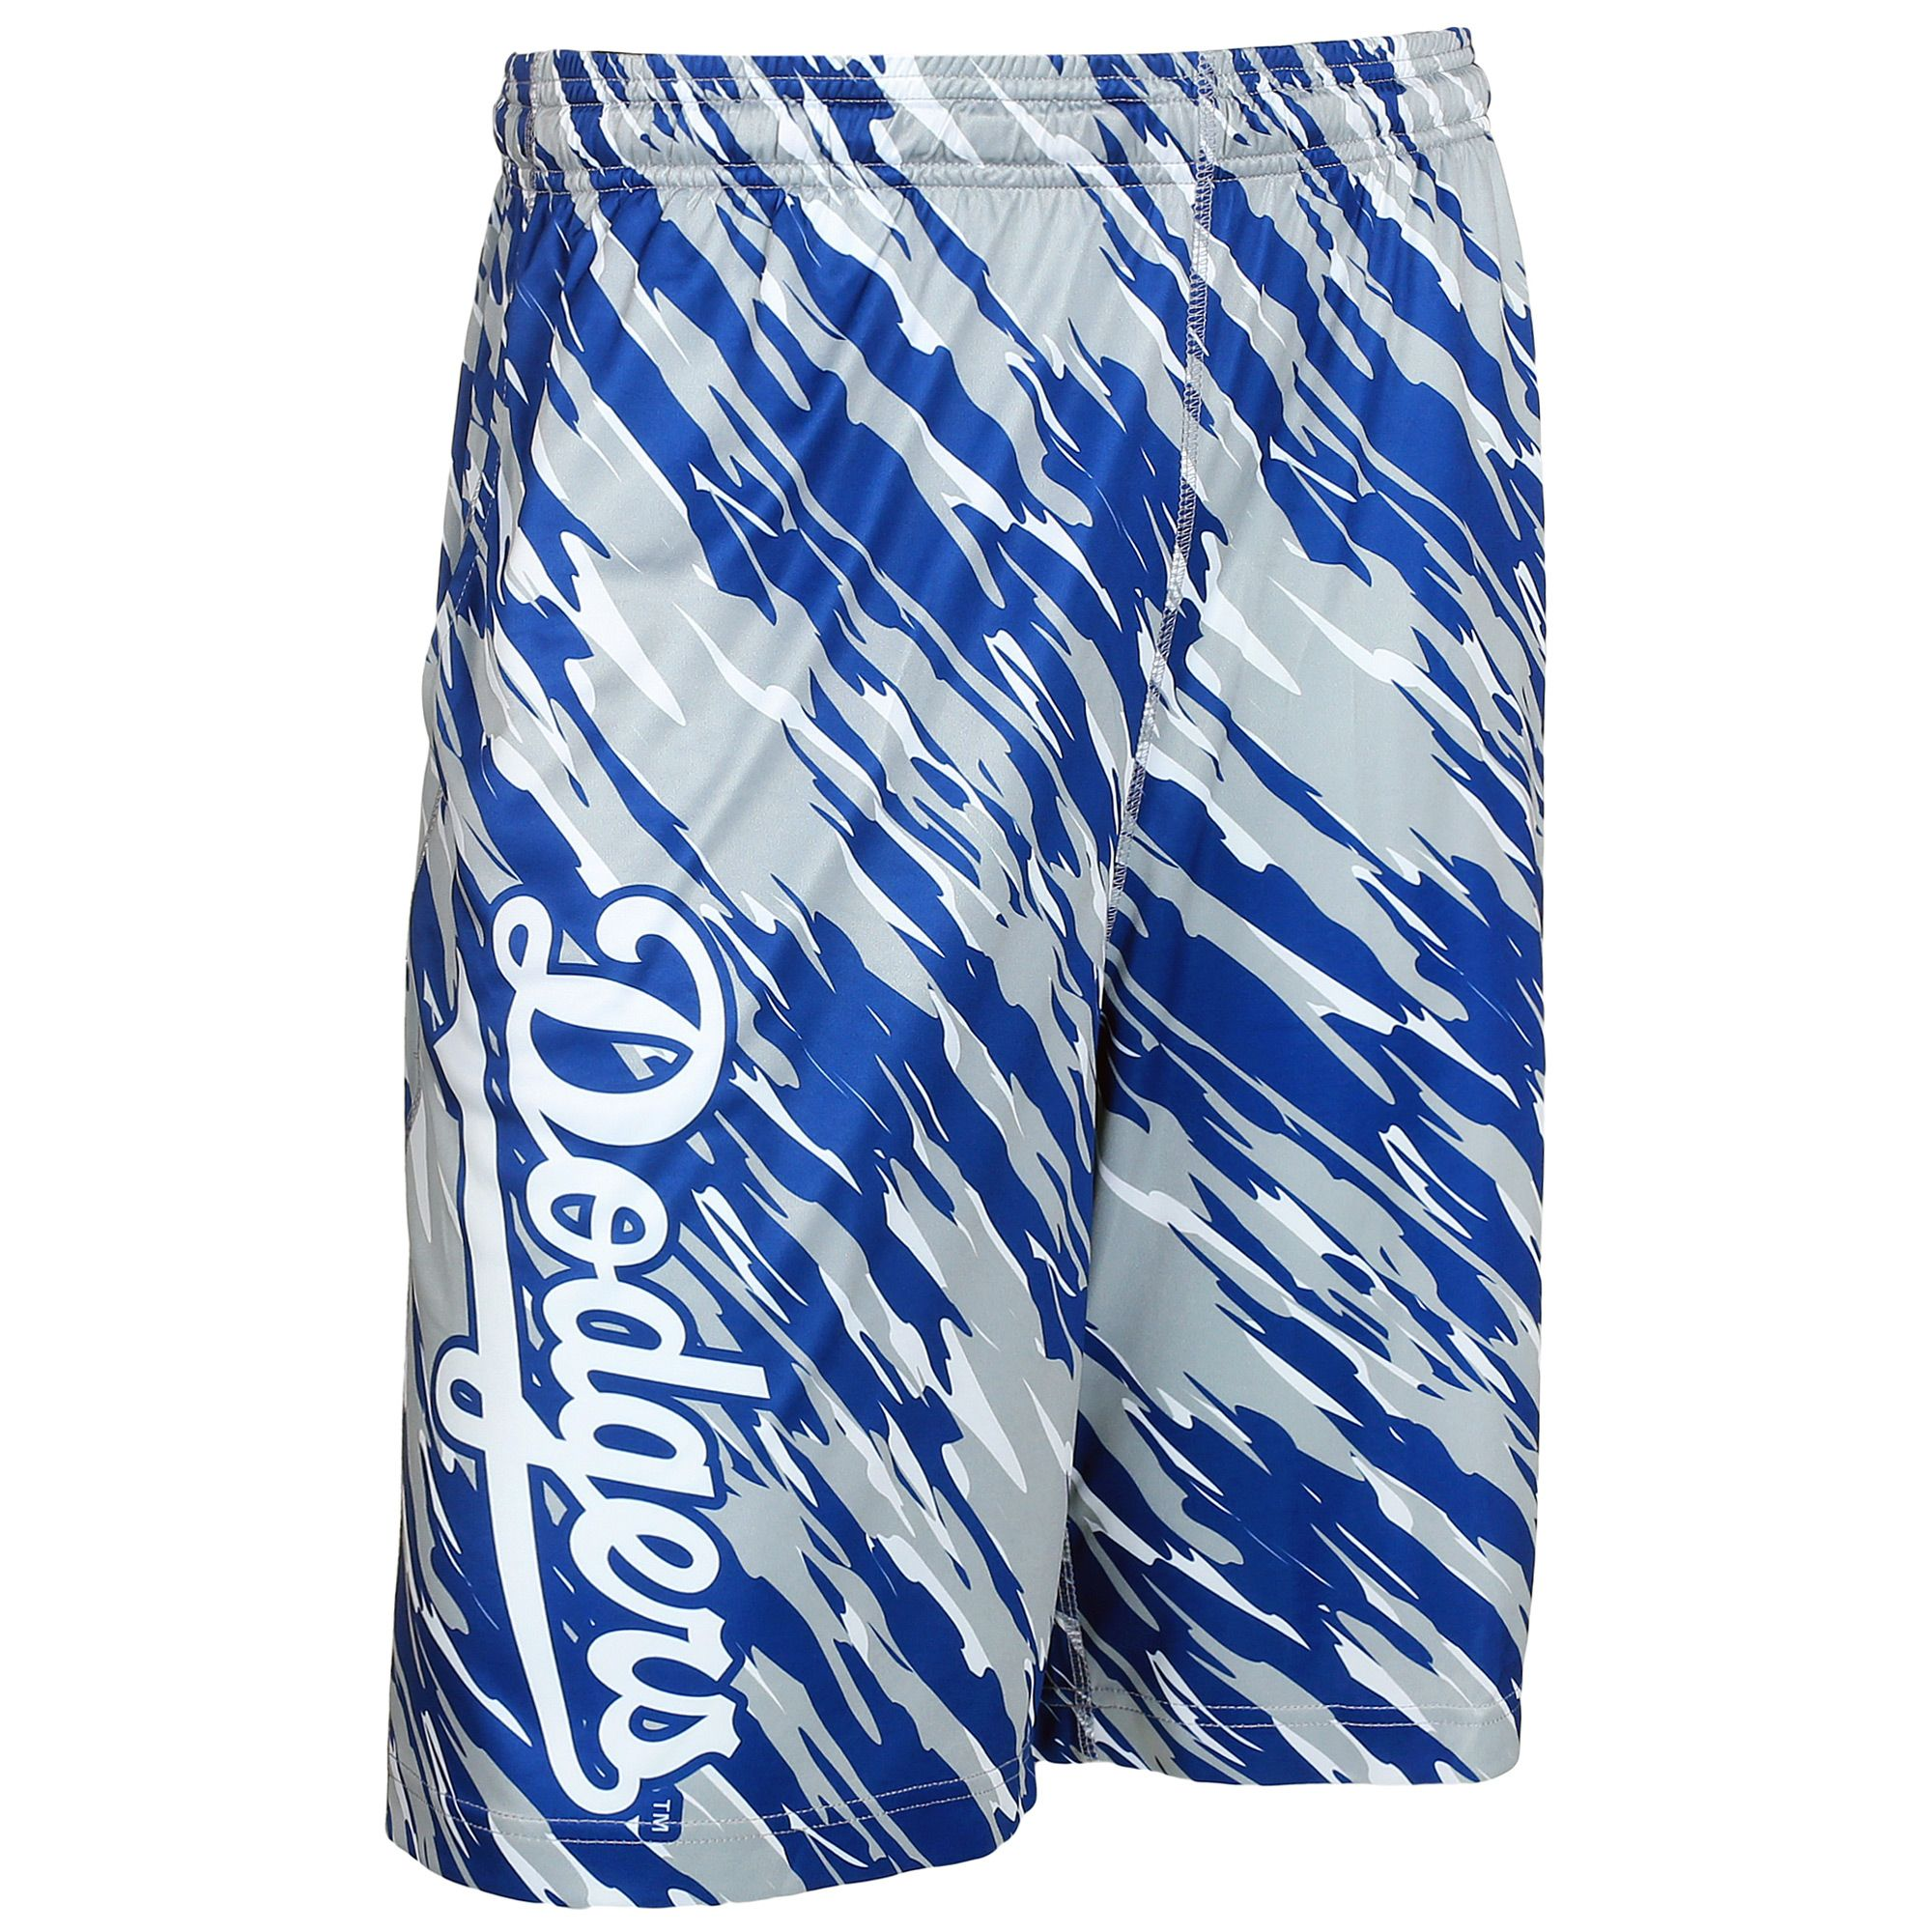 Showcasing Men S Baseball Fashion Bottoms We Bring Licensed Team Sports Fanwear Fashion Trends To Baseball Fans Dodgers Los Angeles Dodgers Baseball Fashion